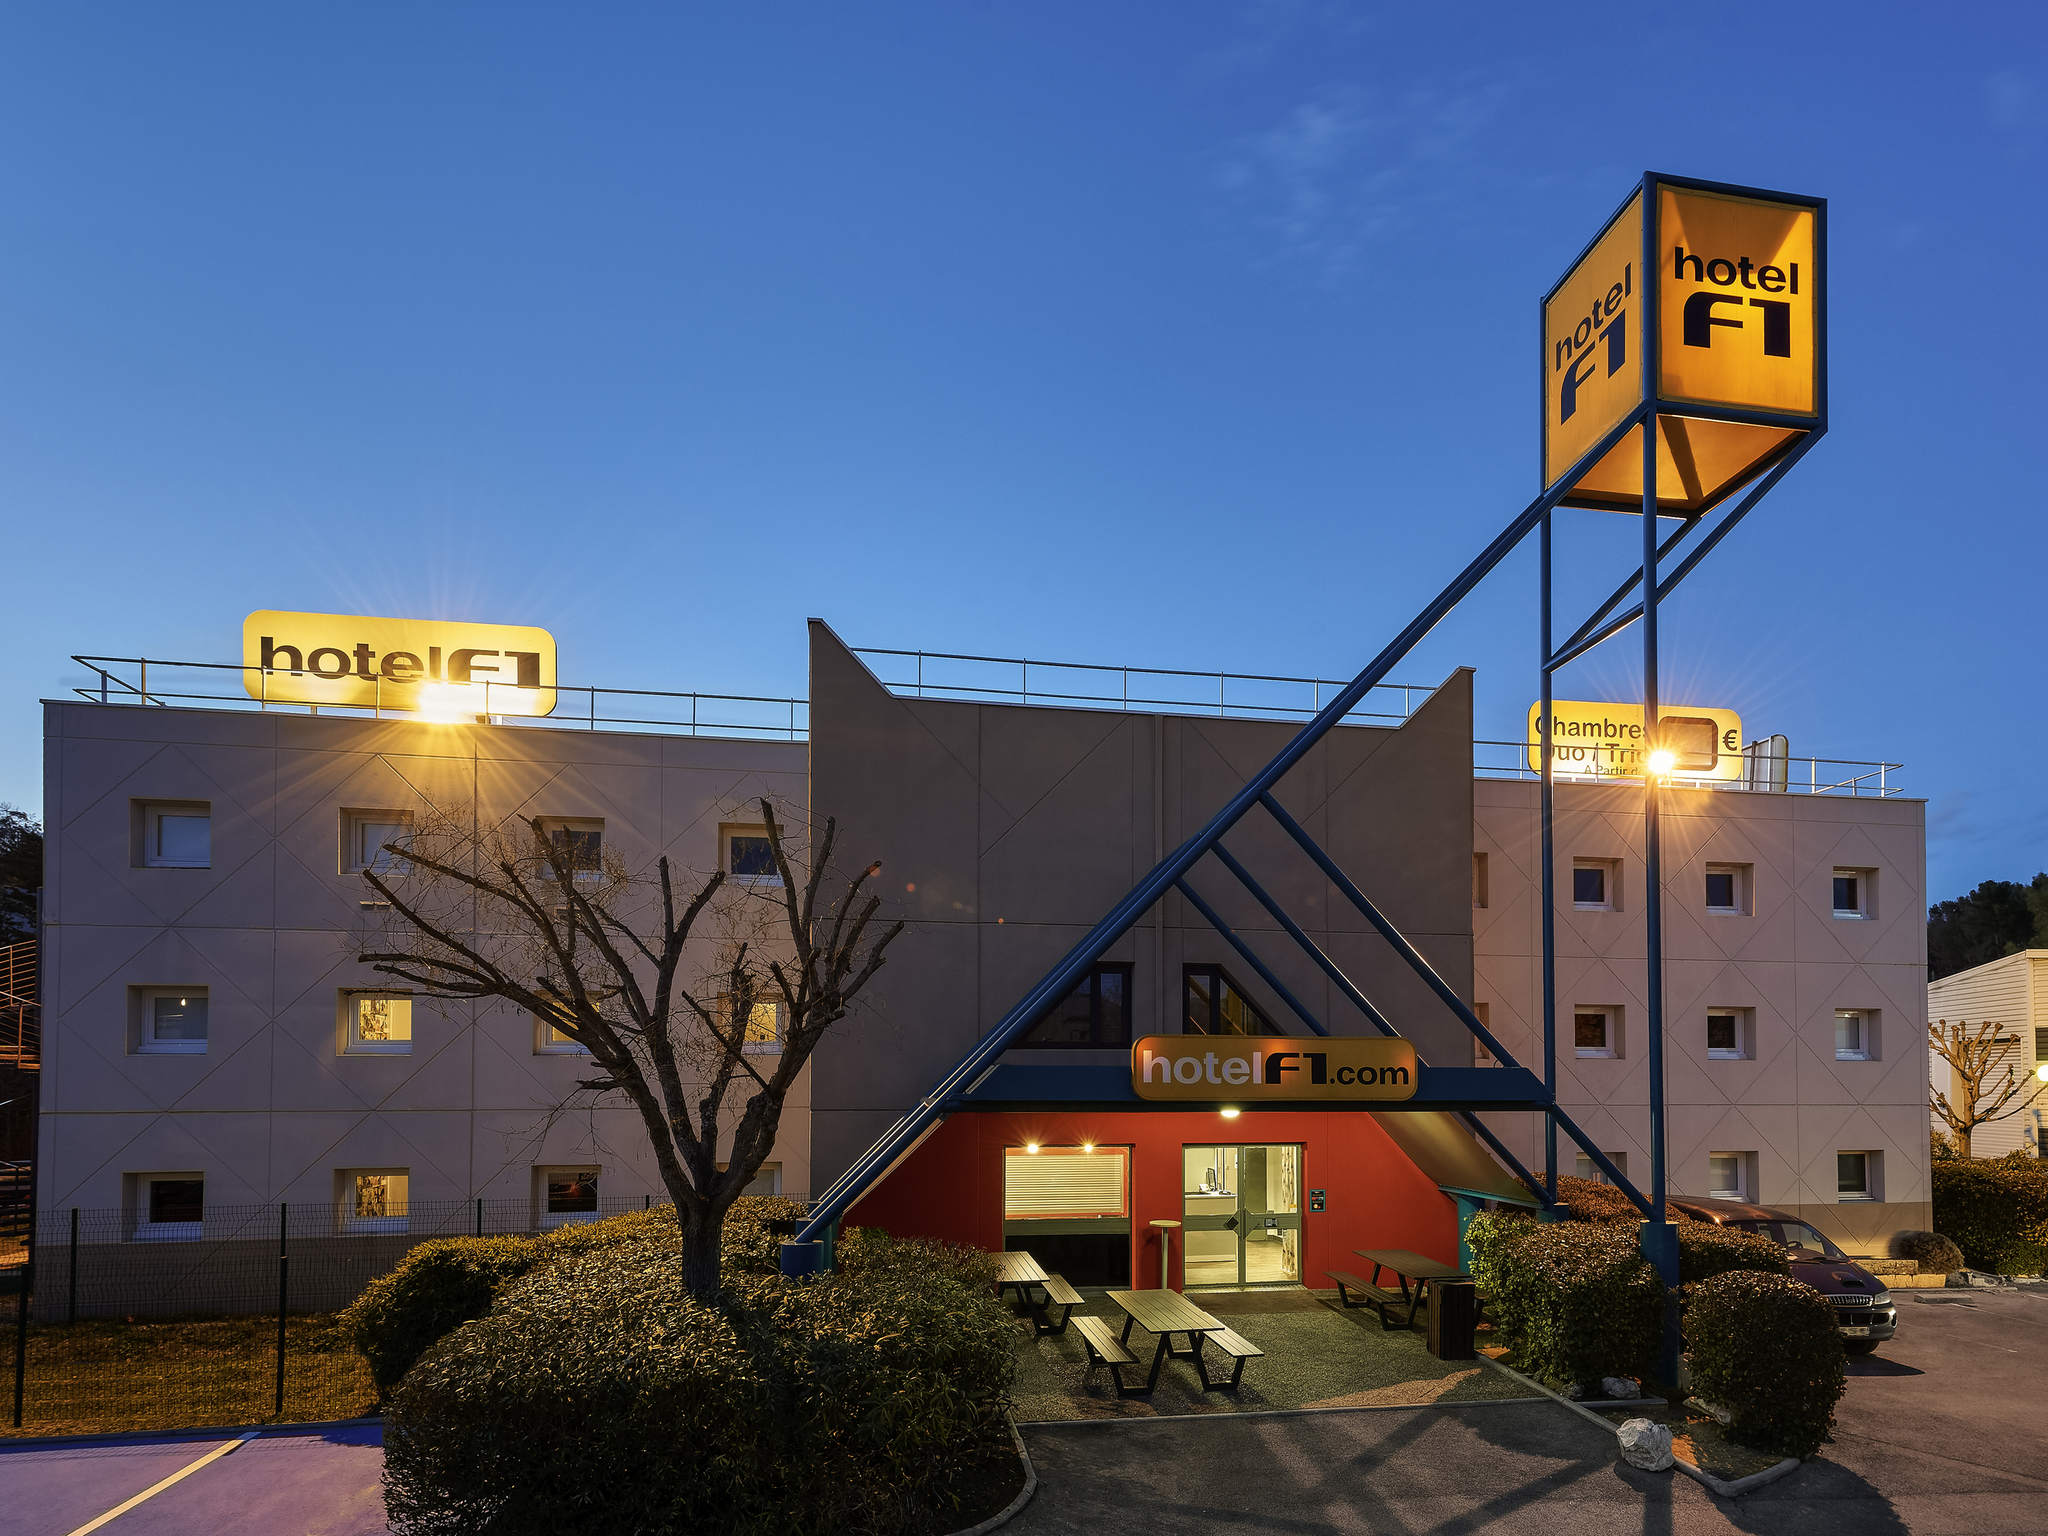 Отель — hotelF1 Marseille La Valentine (rénové)